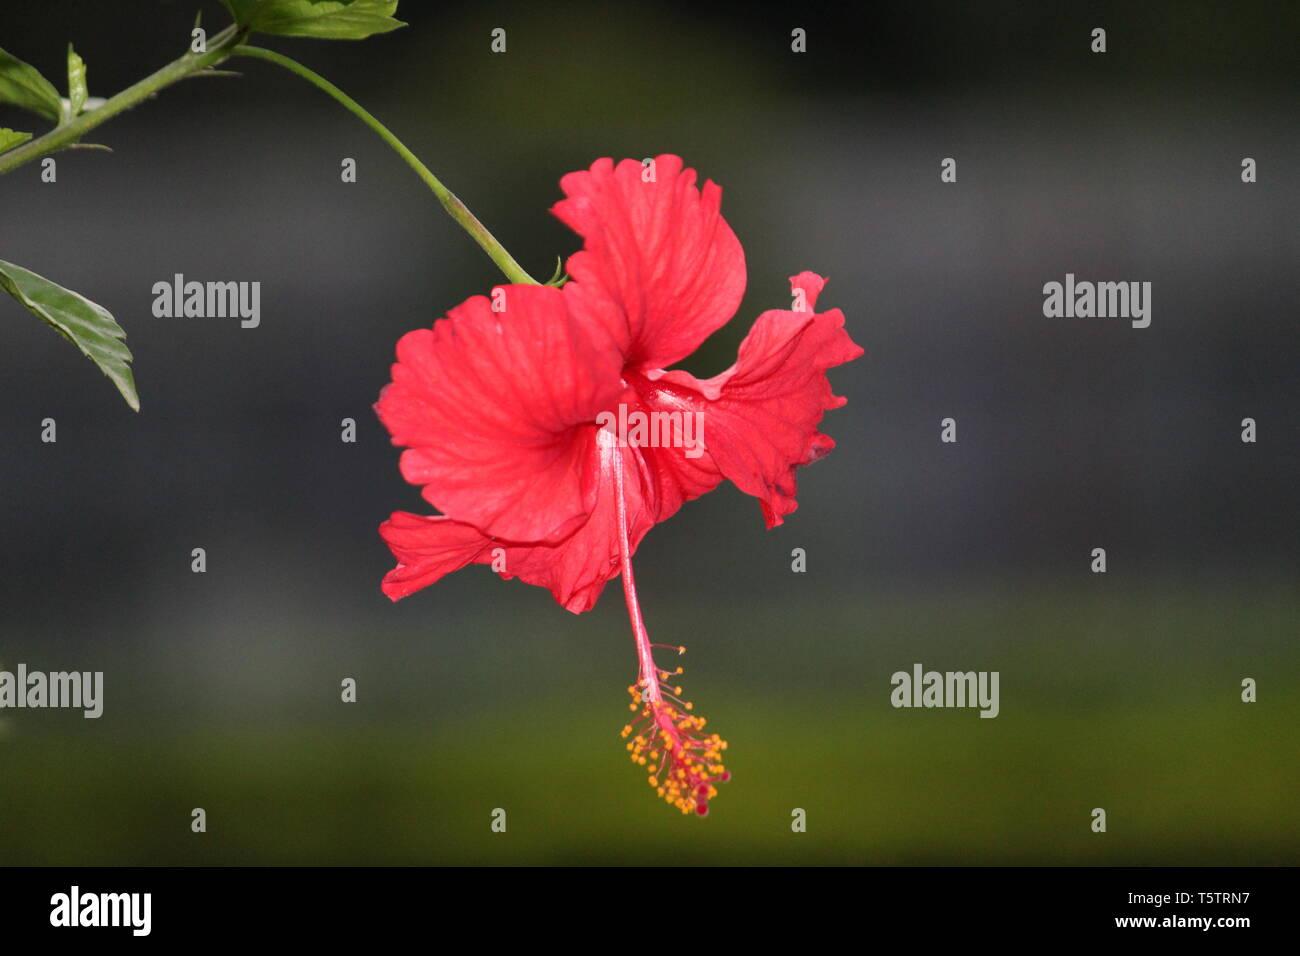 Indian Hibiscus Flowers Stock Photos Indian Hibiscus Flowers Stock